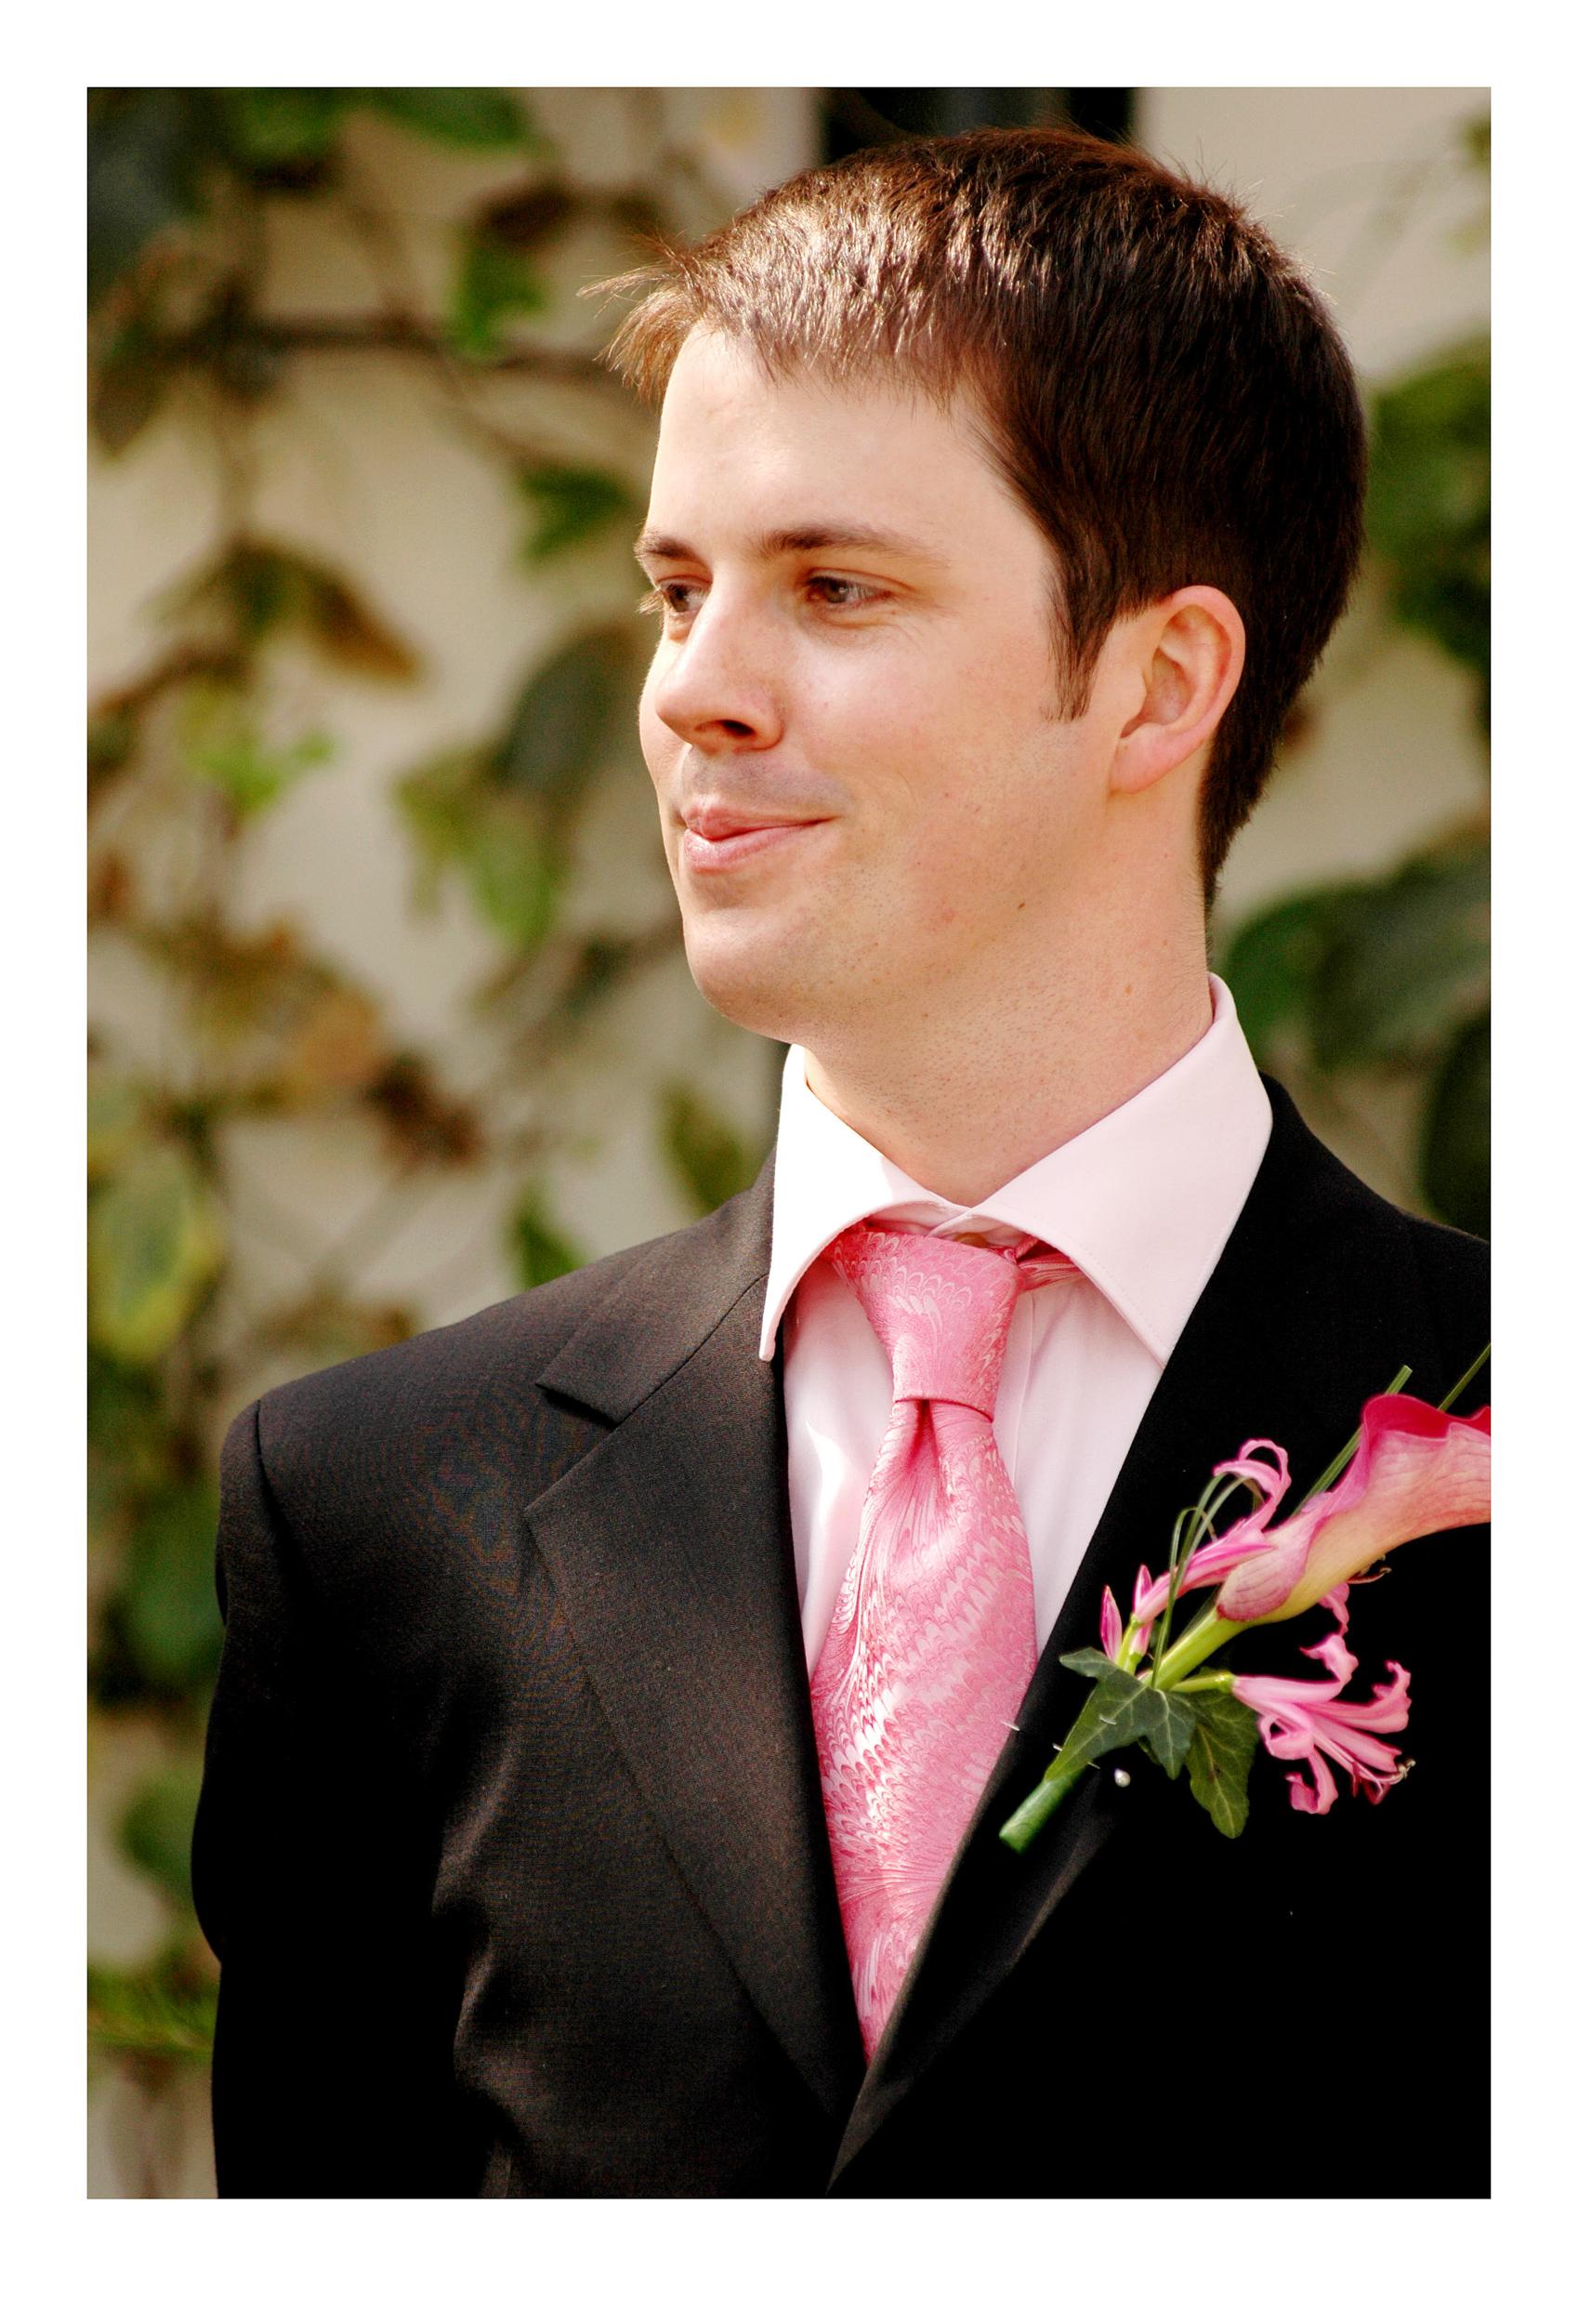 REPORTAGE-WEDDING-PHOTOGRAPHY-SET-UK-12.jpg